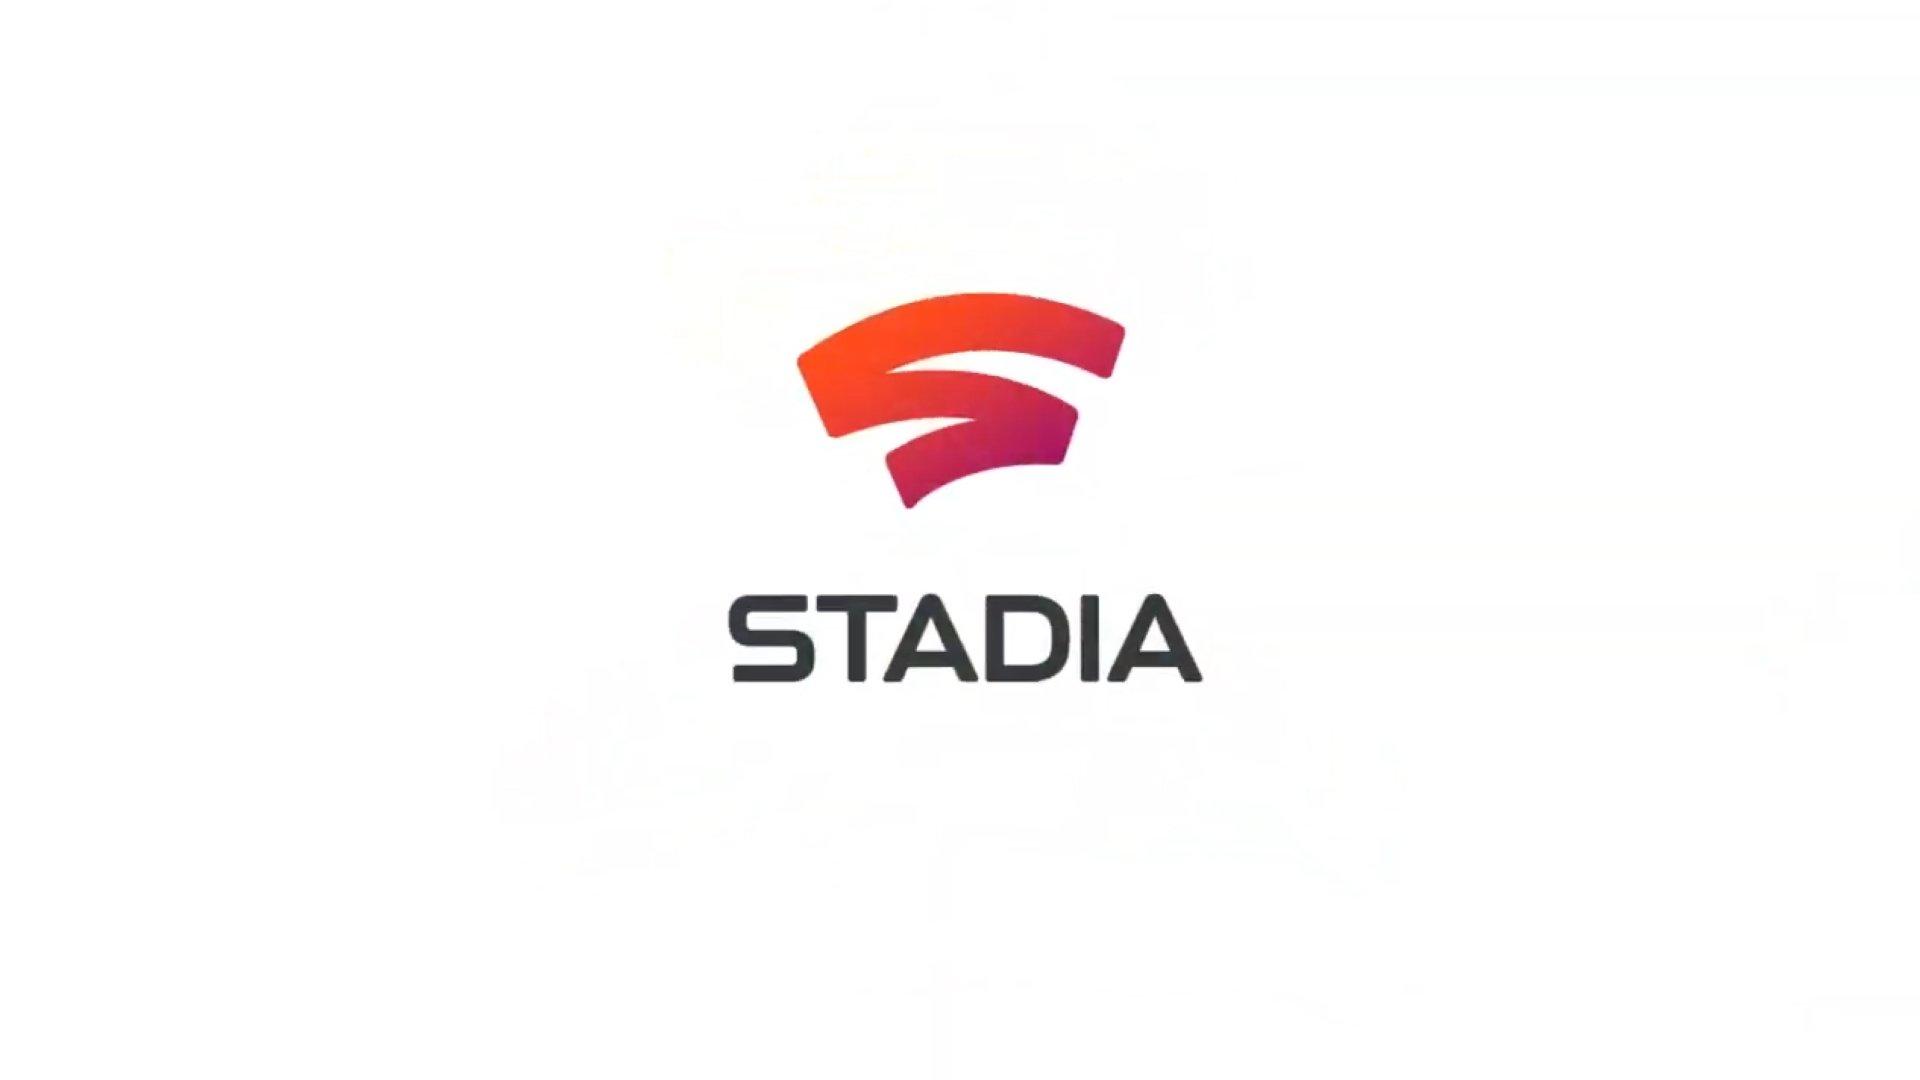 Google Stadia chromecast overheating issue